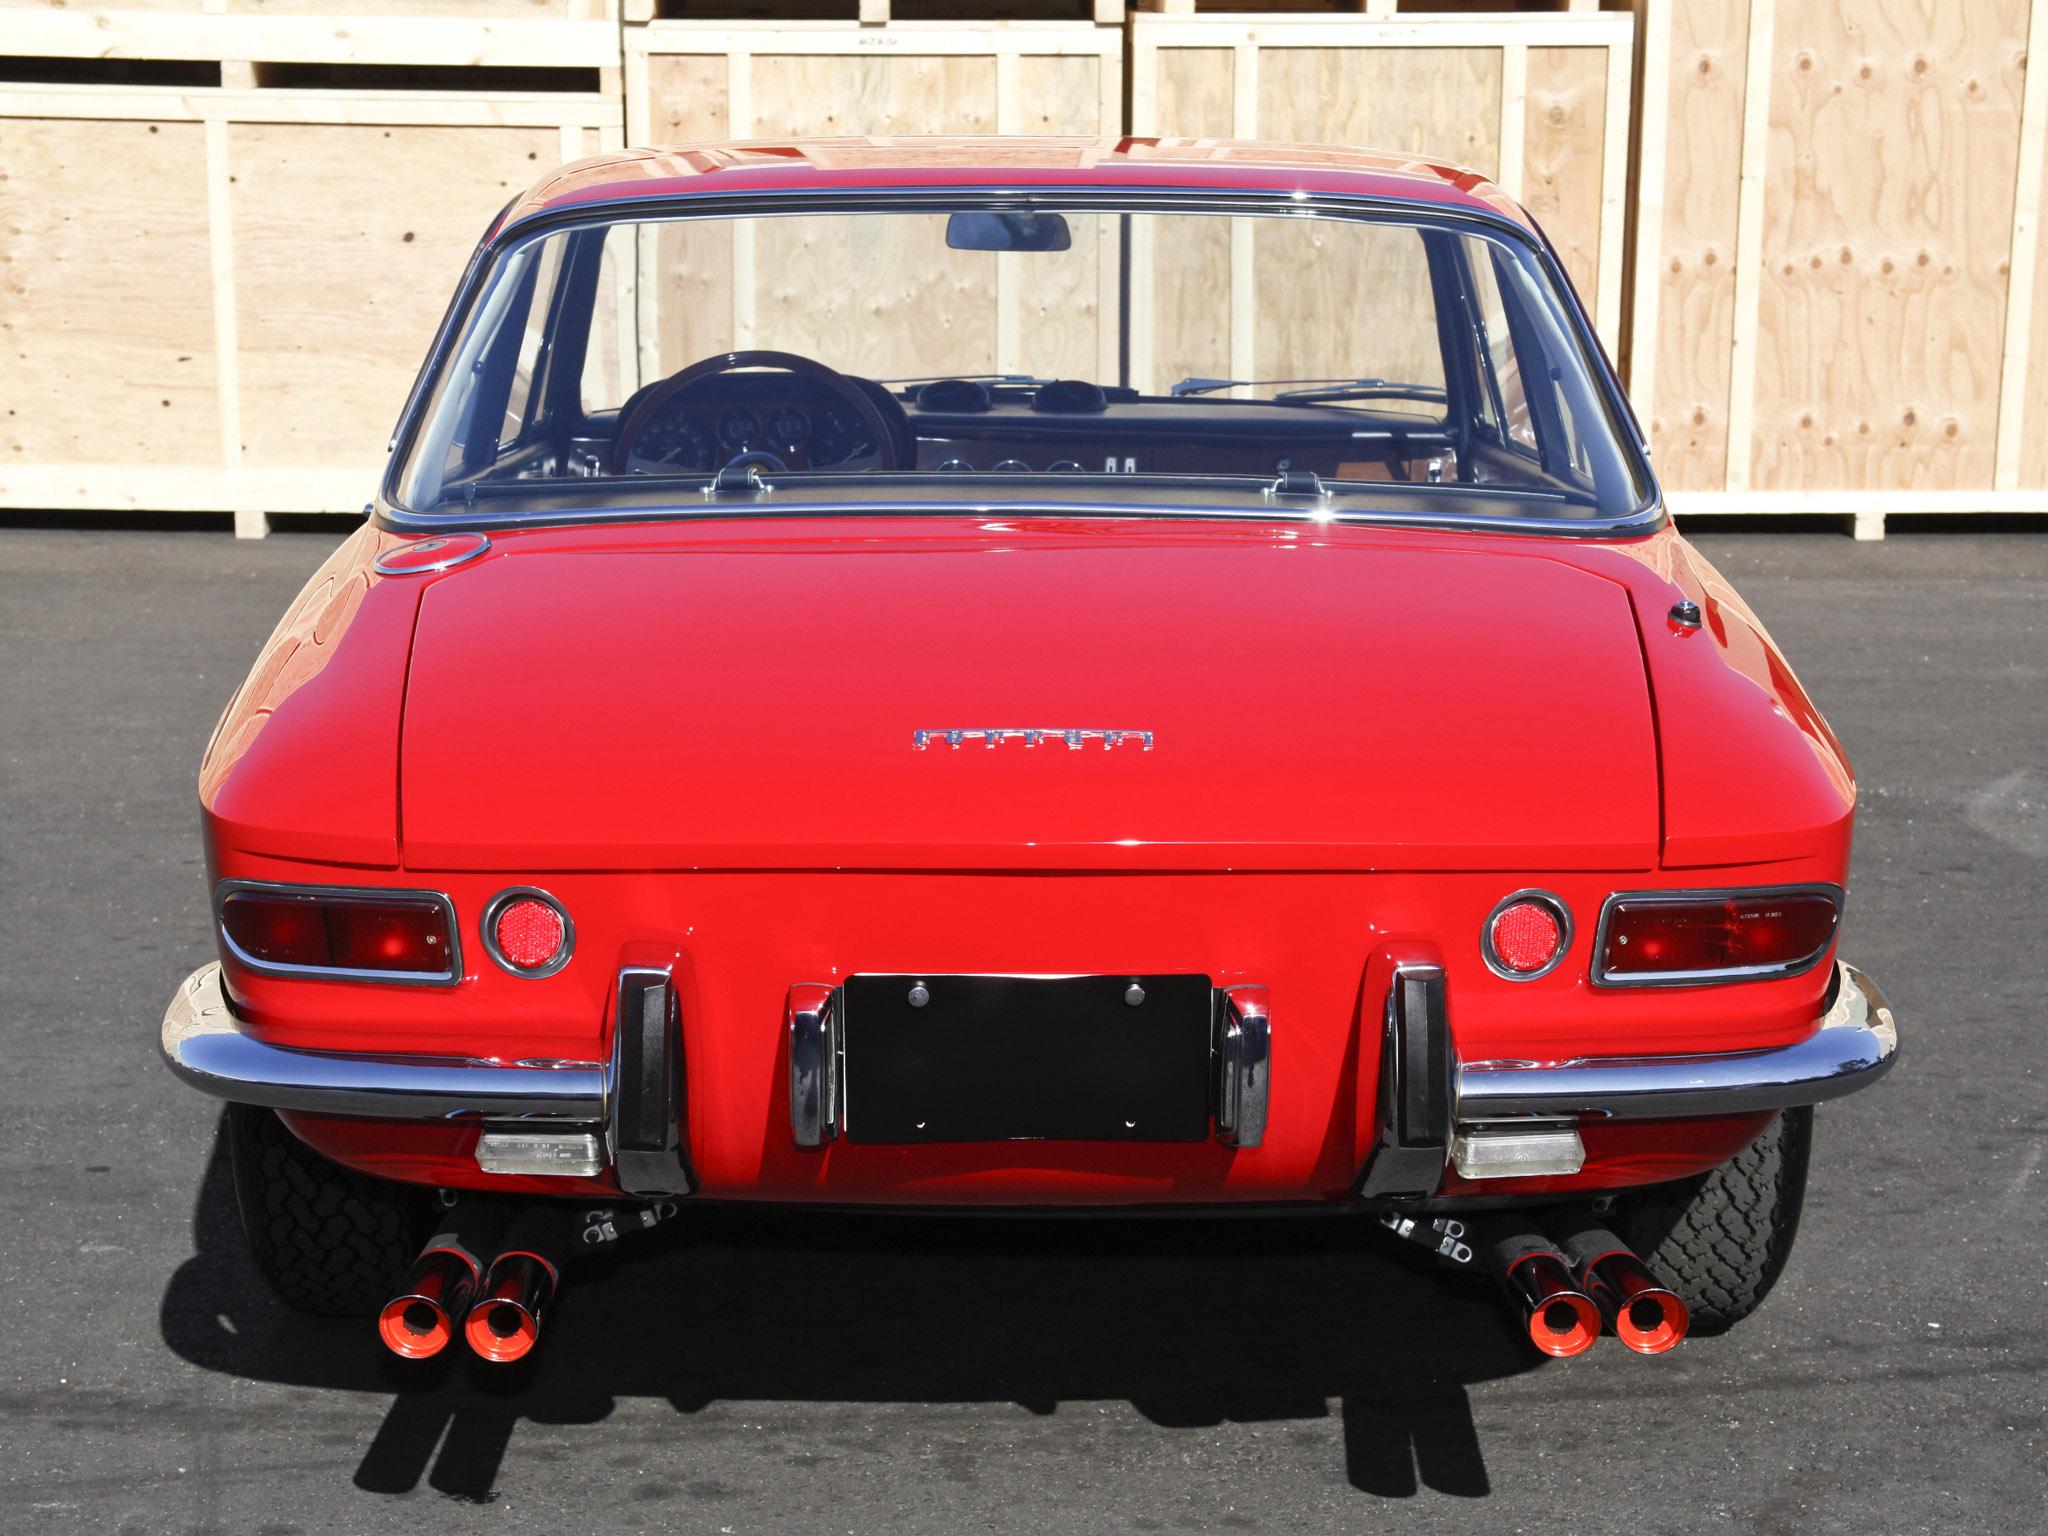 Ferrari 365 gtc 1968 1969 ferrari 365 gtc 1968 1969 photo 06 car download full size 2048 1536 pixels vanachro Image collections